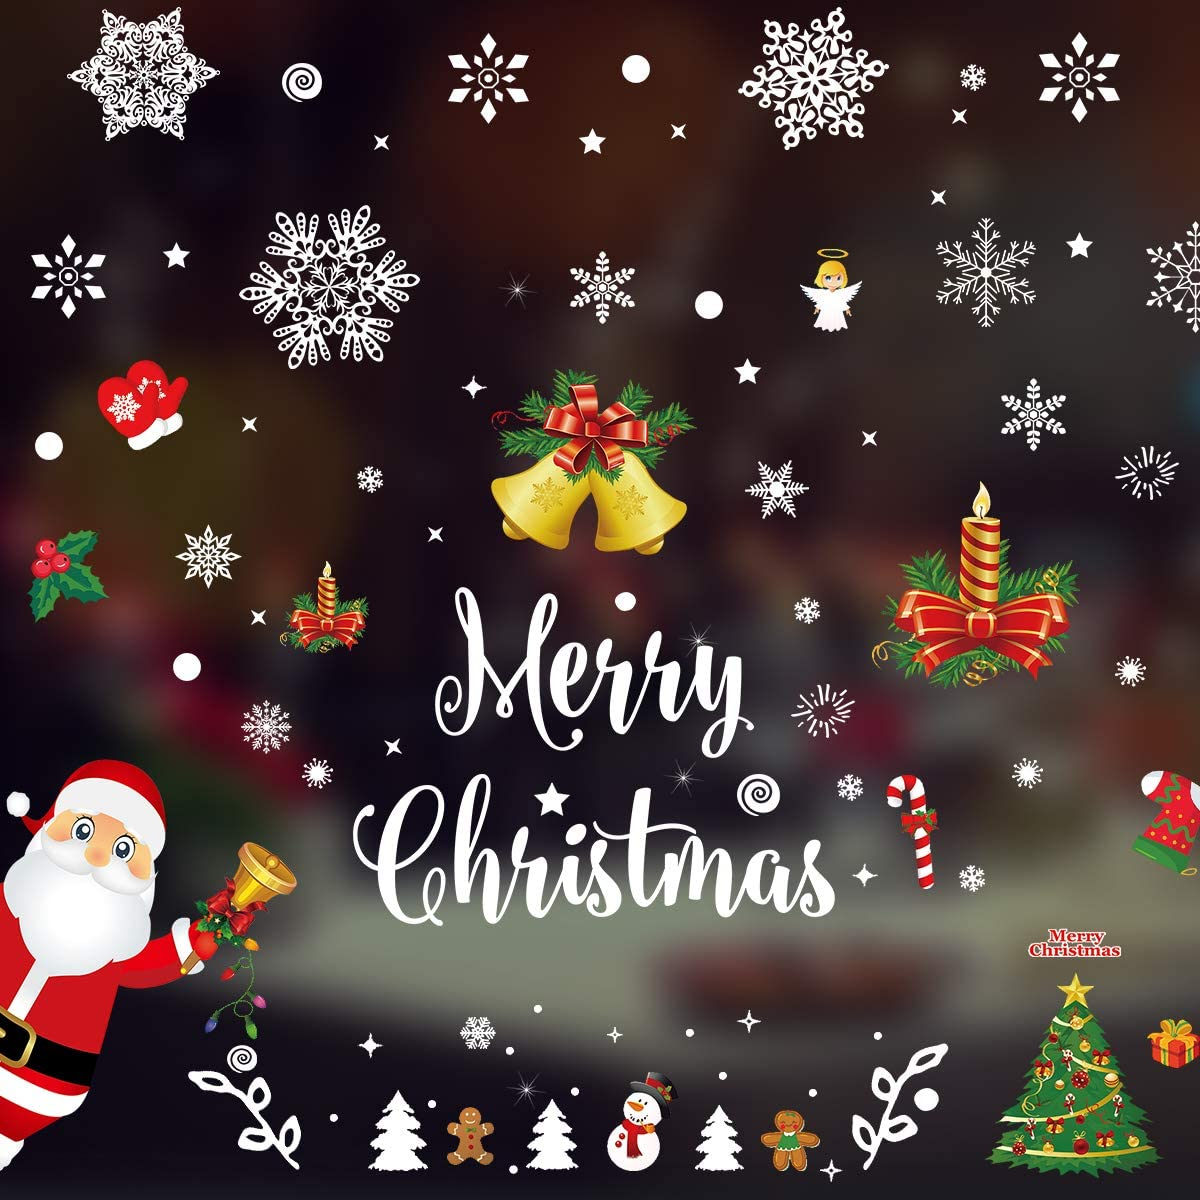 Window Sticker Christmas Holiday Decorative